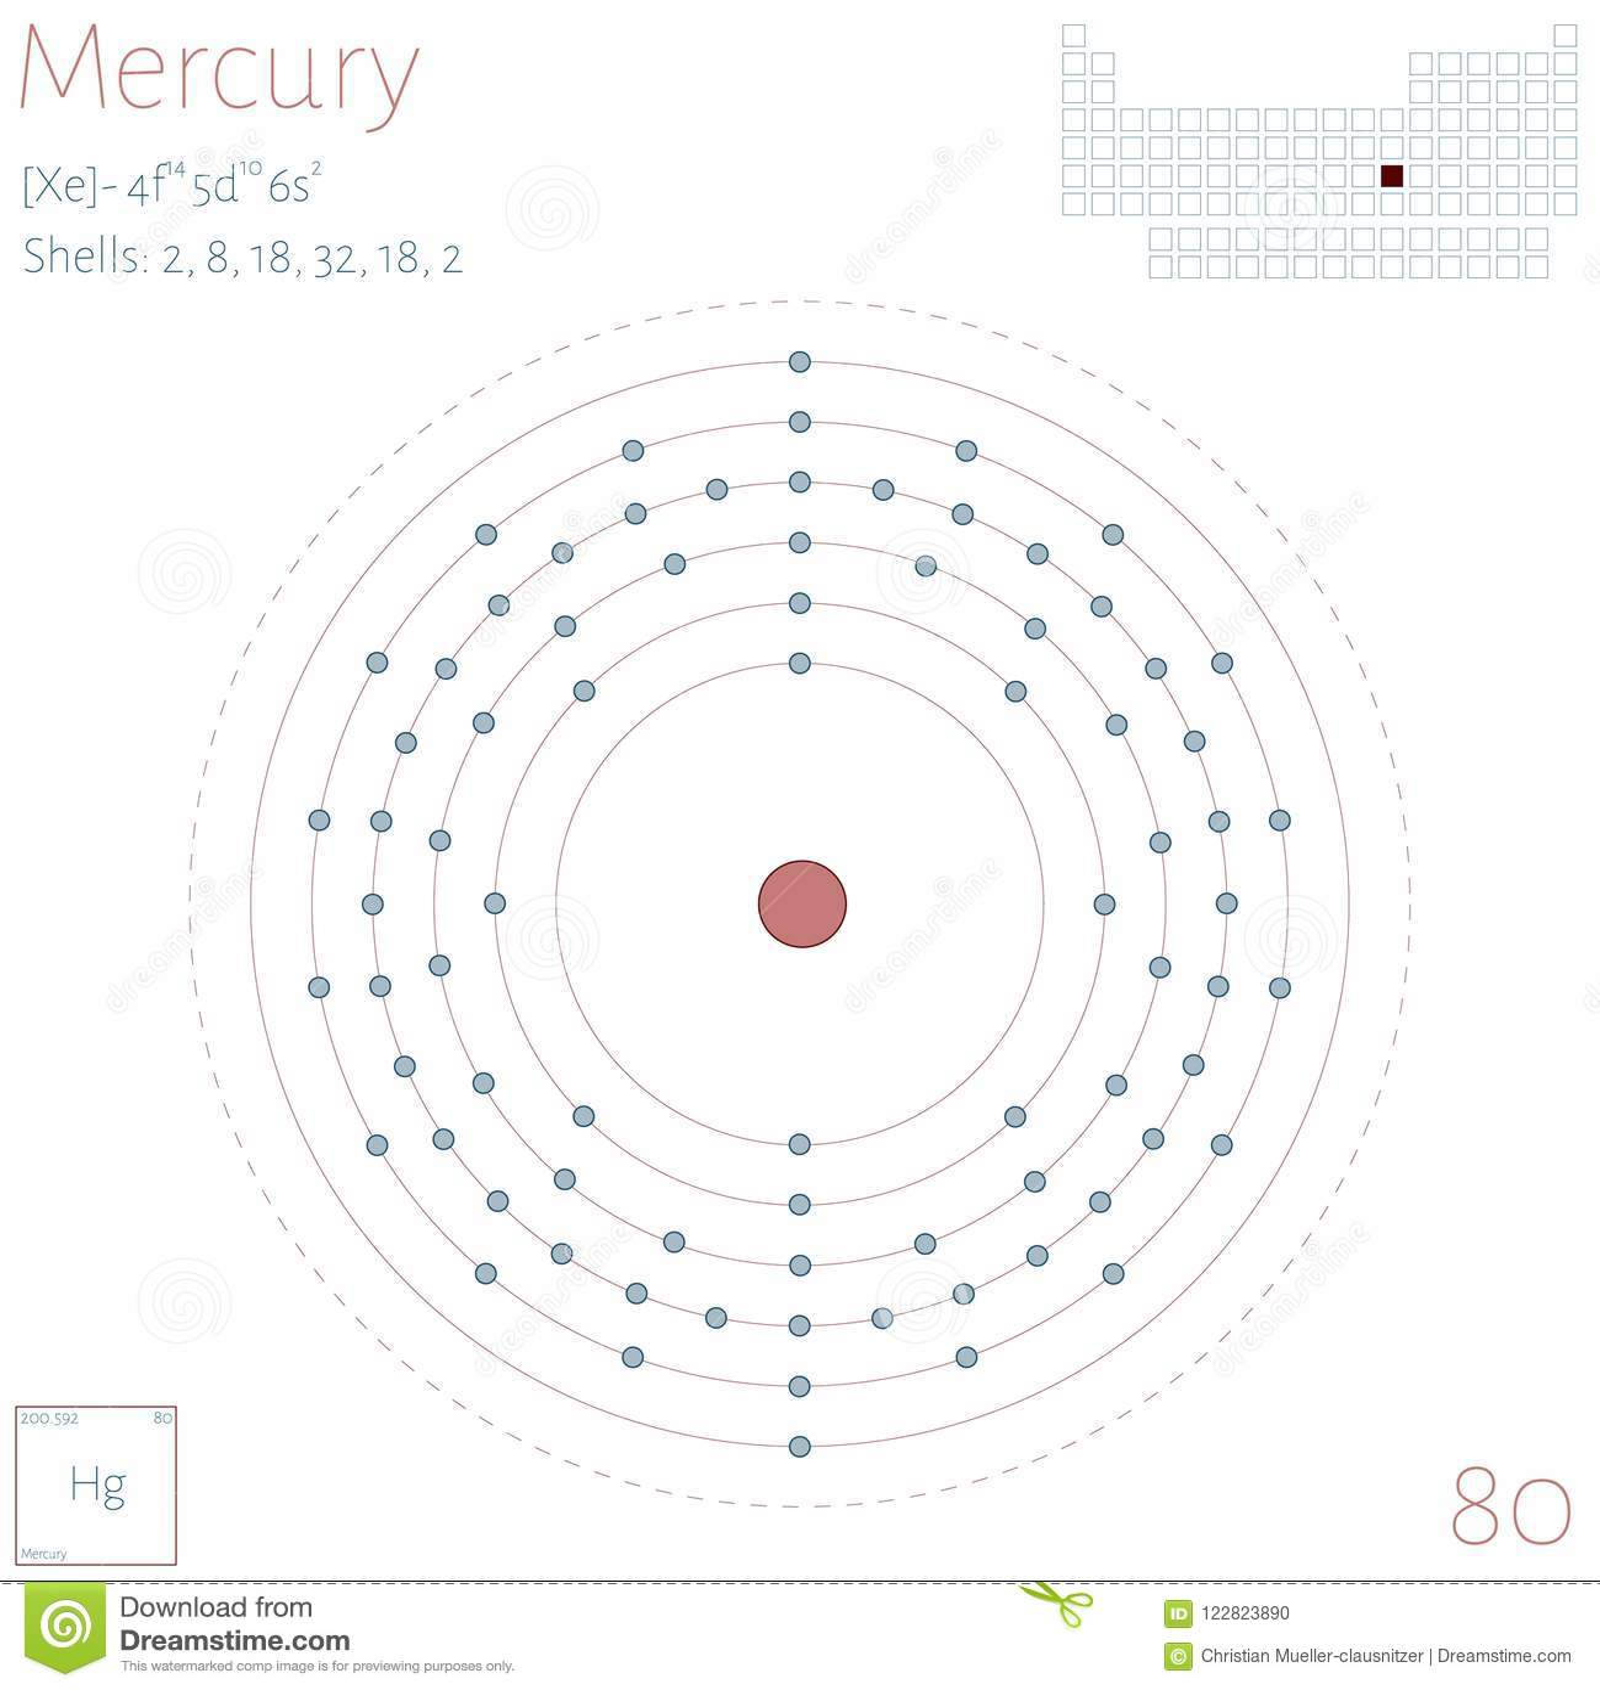 Diagram Of A Mercury Atom - Wiring Diagrams Folder on